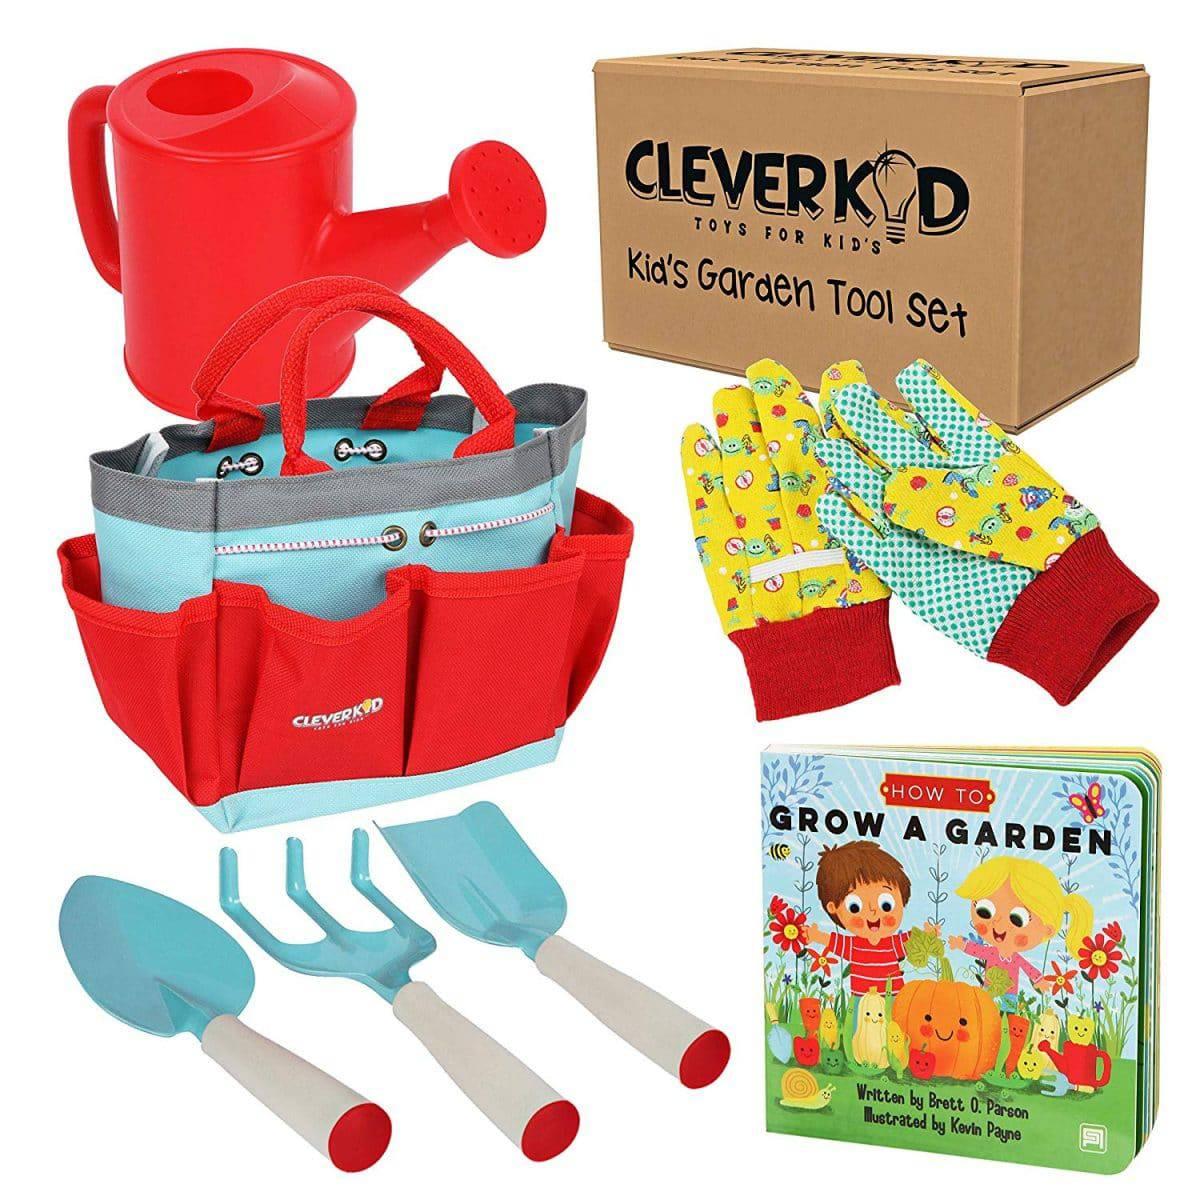 NEW Set of 2 Kids Garden Tools Trowel Spade Gardening Beach Toy Gift Set UK